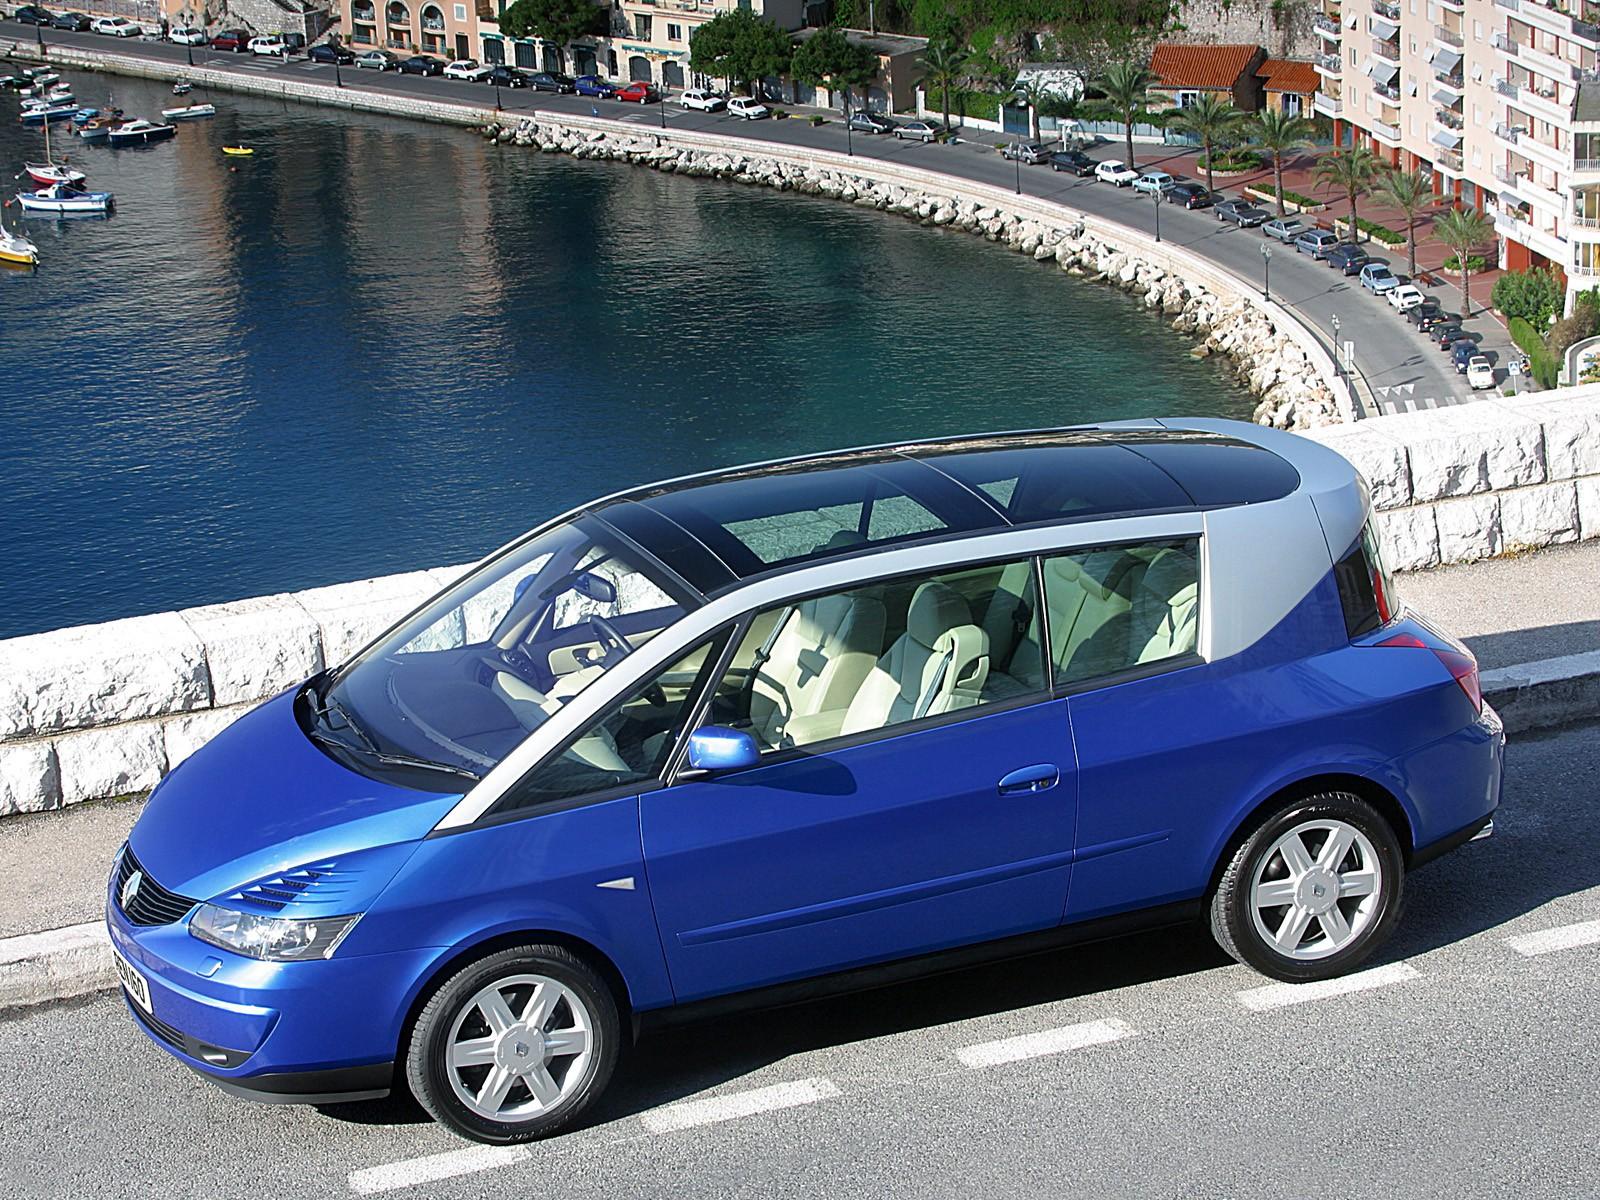 Renault Avantime 2001 - 2003 Compact MPV #3